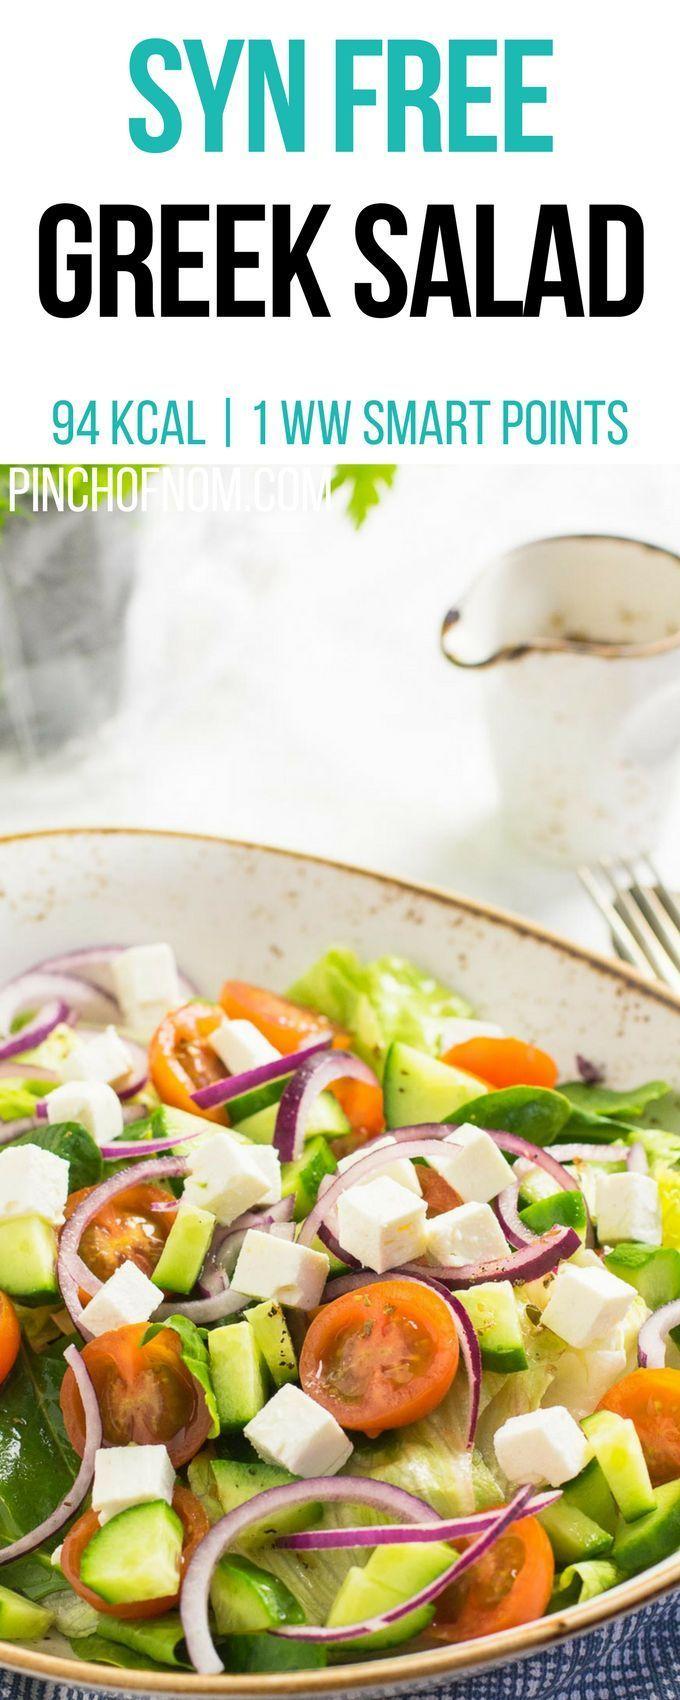 Syn Free Griechischer Salat   Prise Nom Slimming World Rezepte 94 kcal   Syn Fre… – Einfache Salat Rezepte